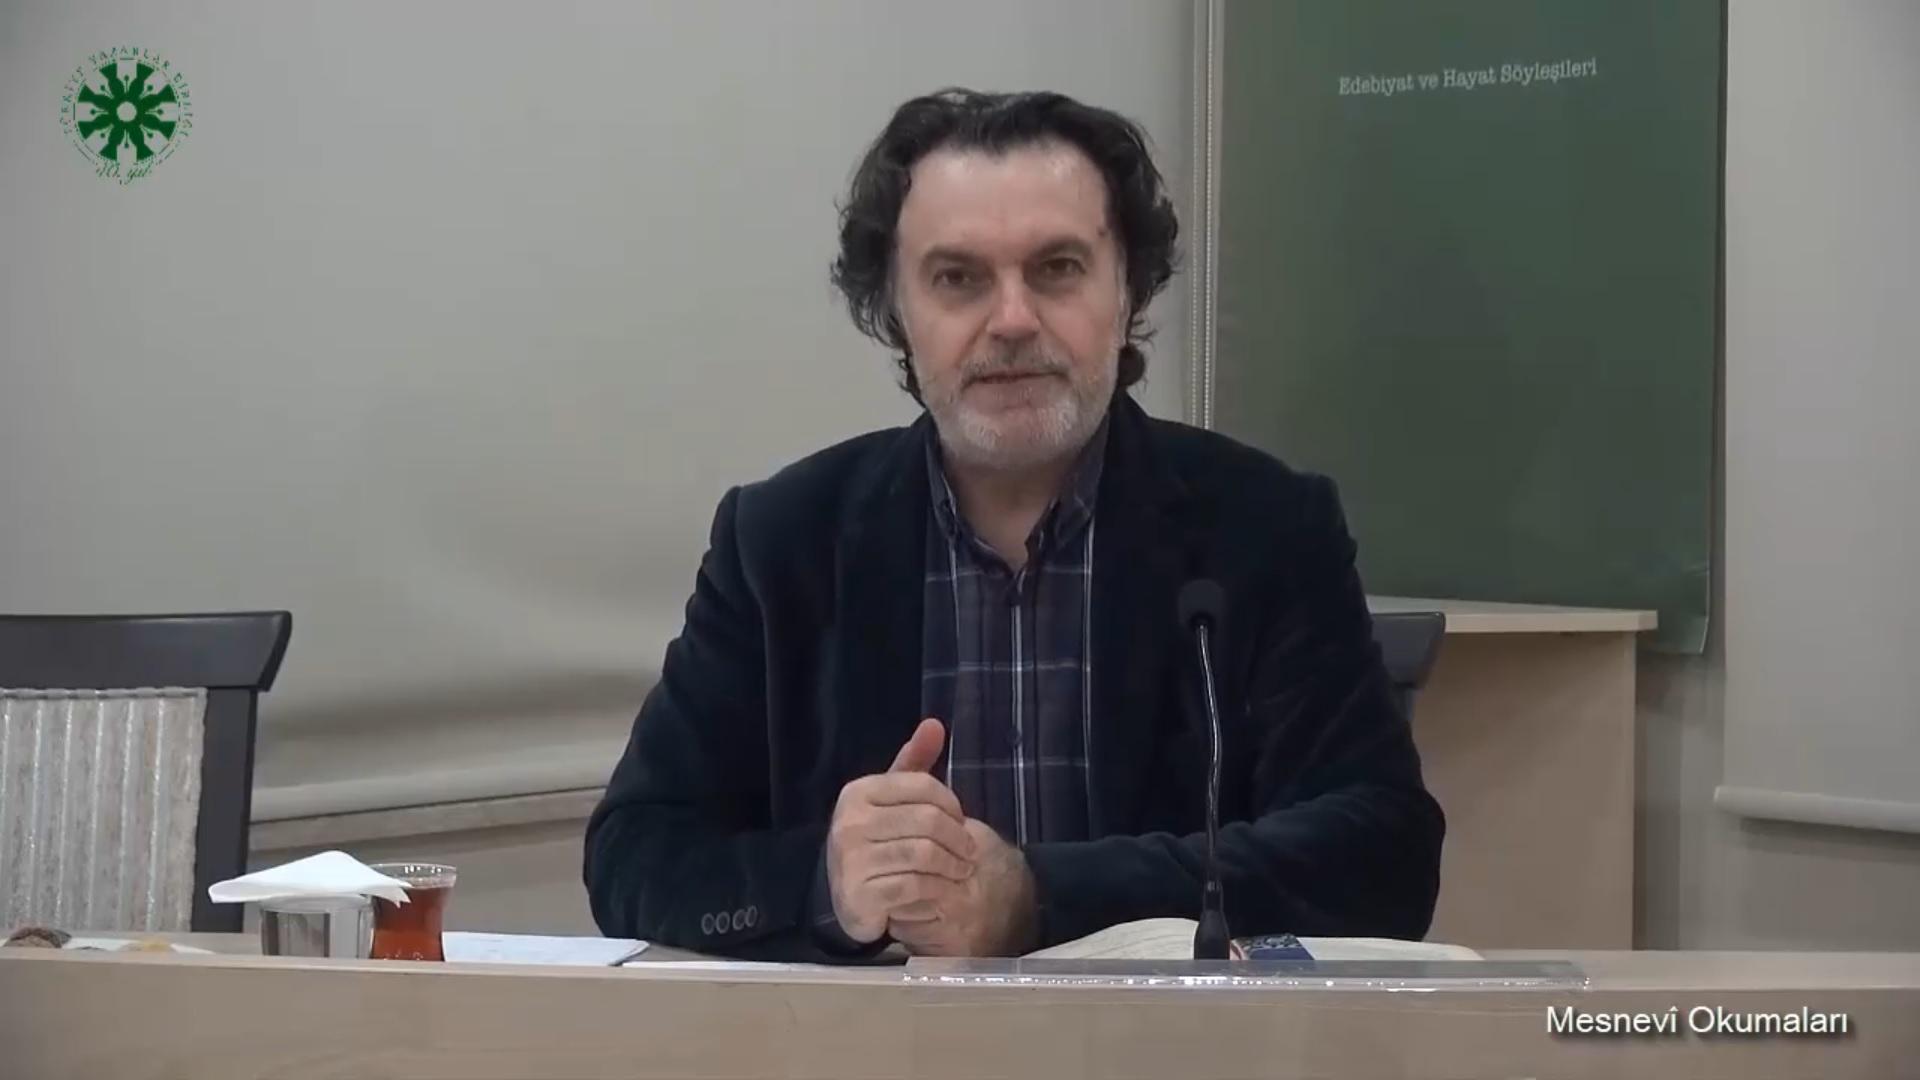 Mesnevî Okumaları - 11 - Prof. Dr. Hicabi Kırlangıç (video)